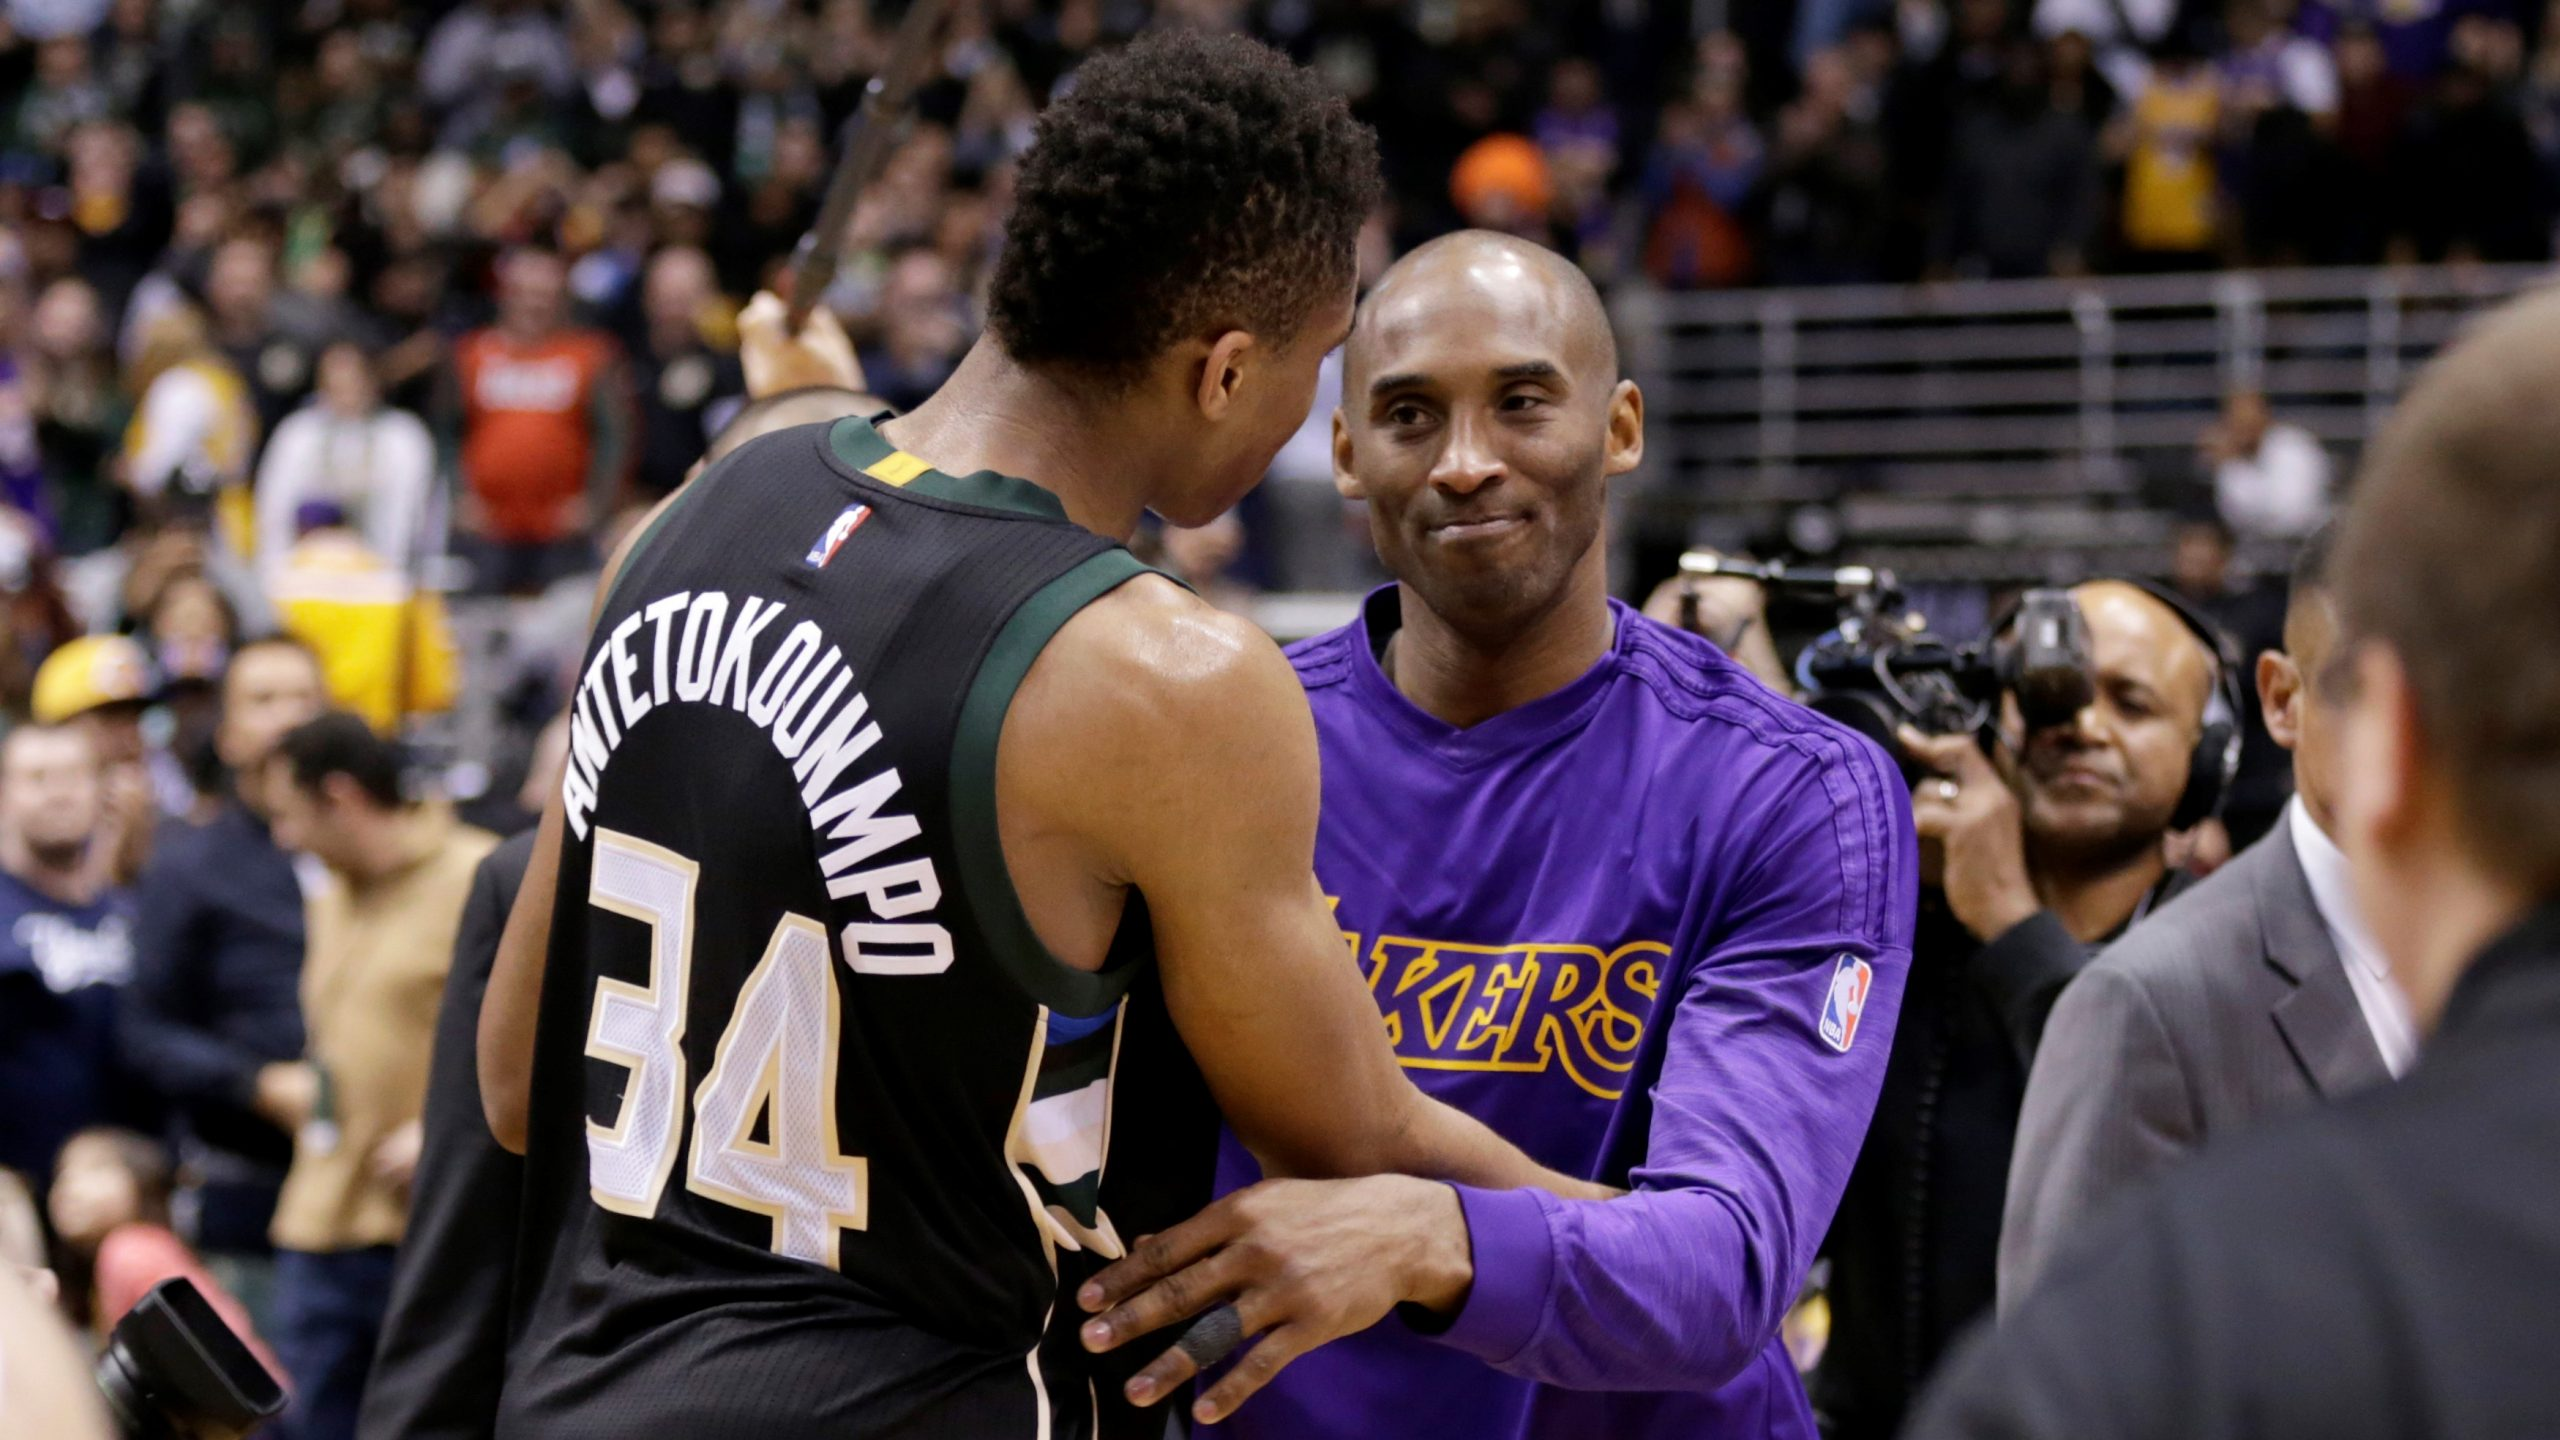 NBA Antetokounmpo Kobe Bryant